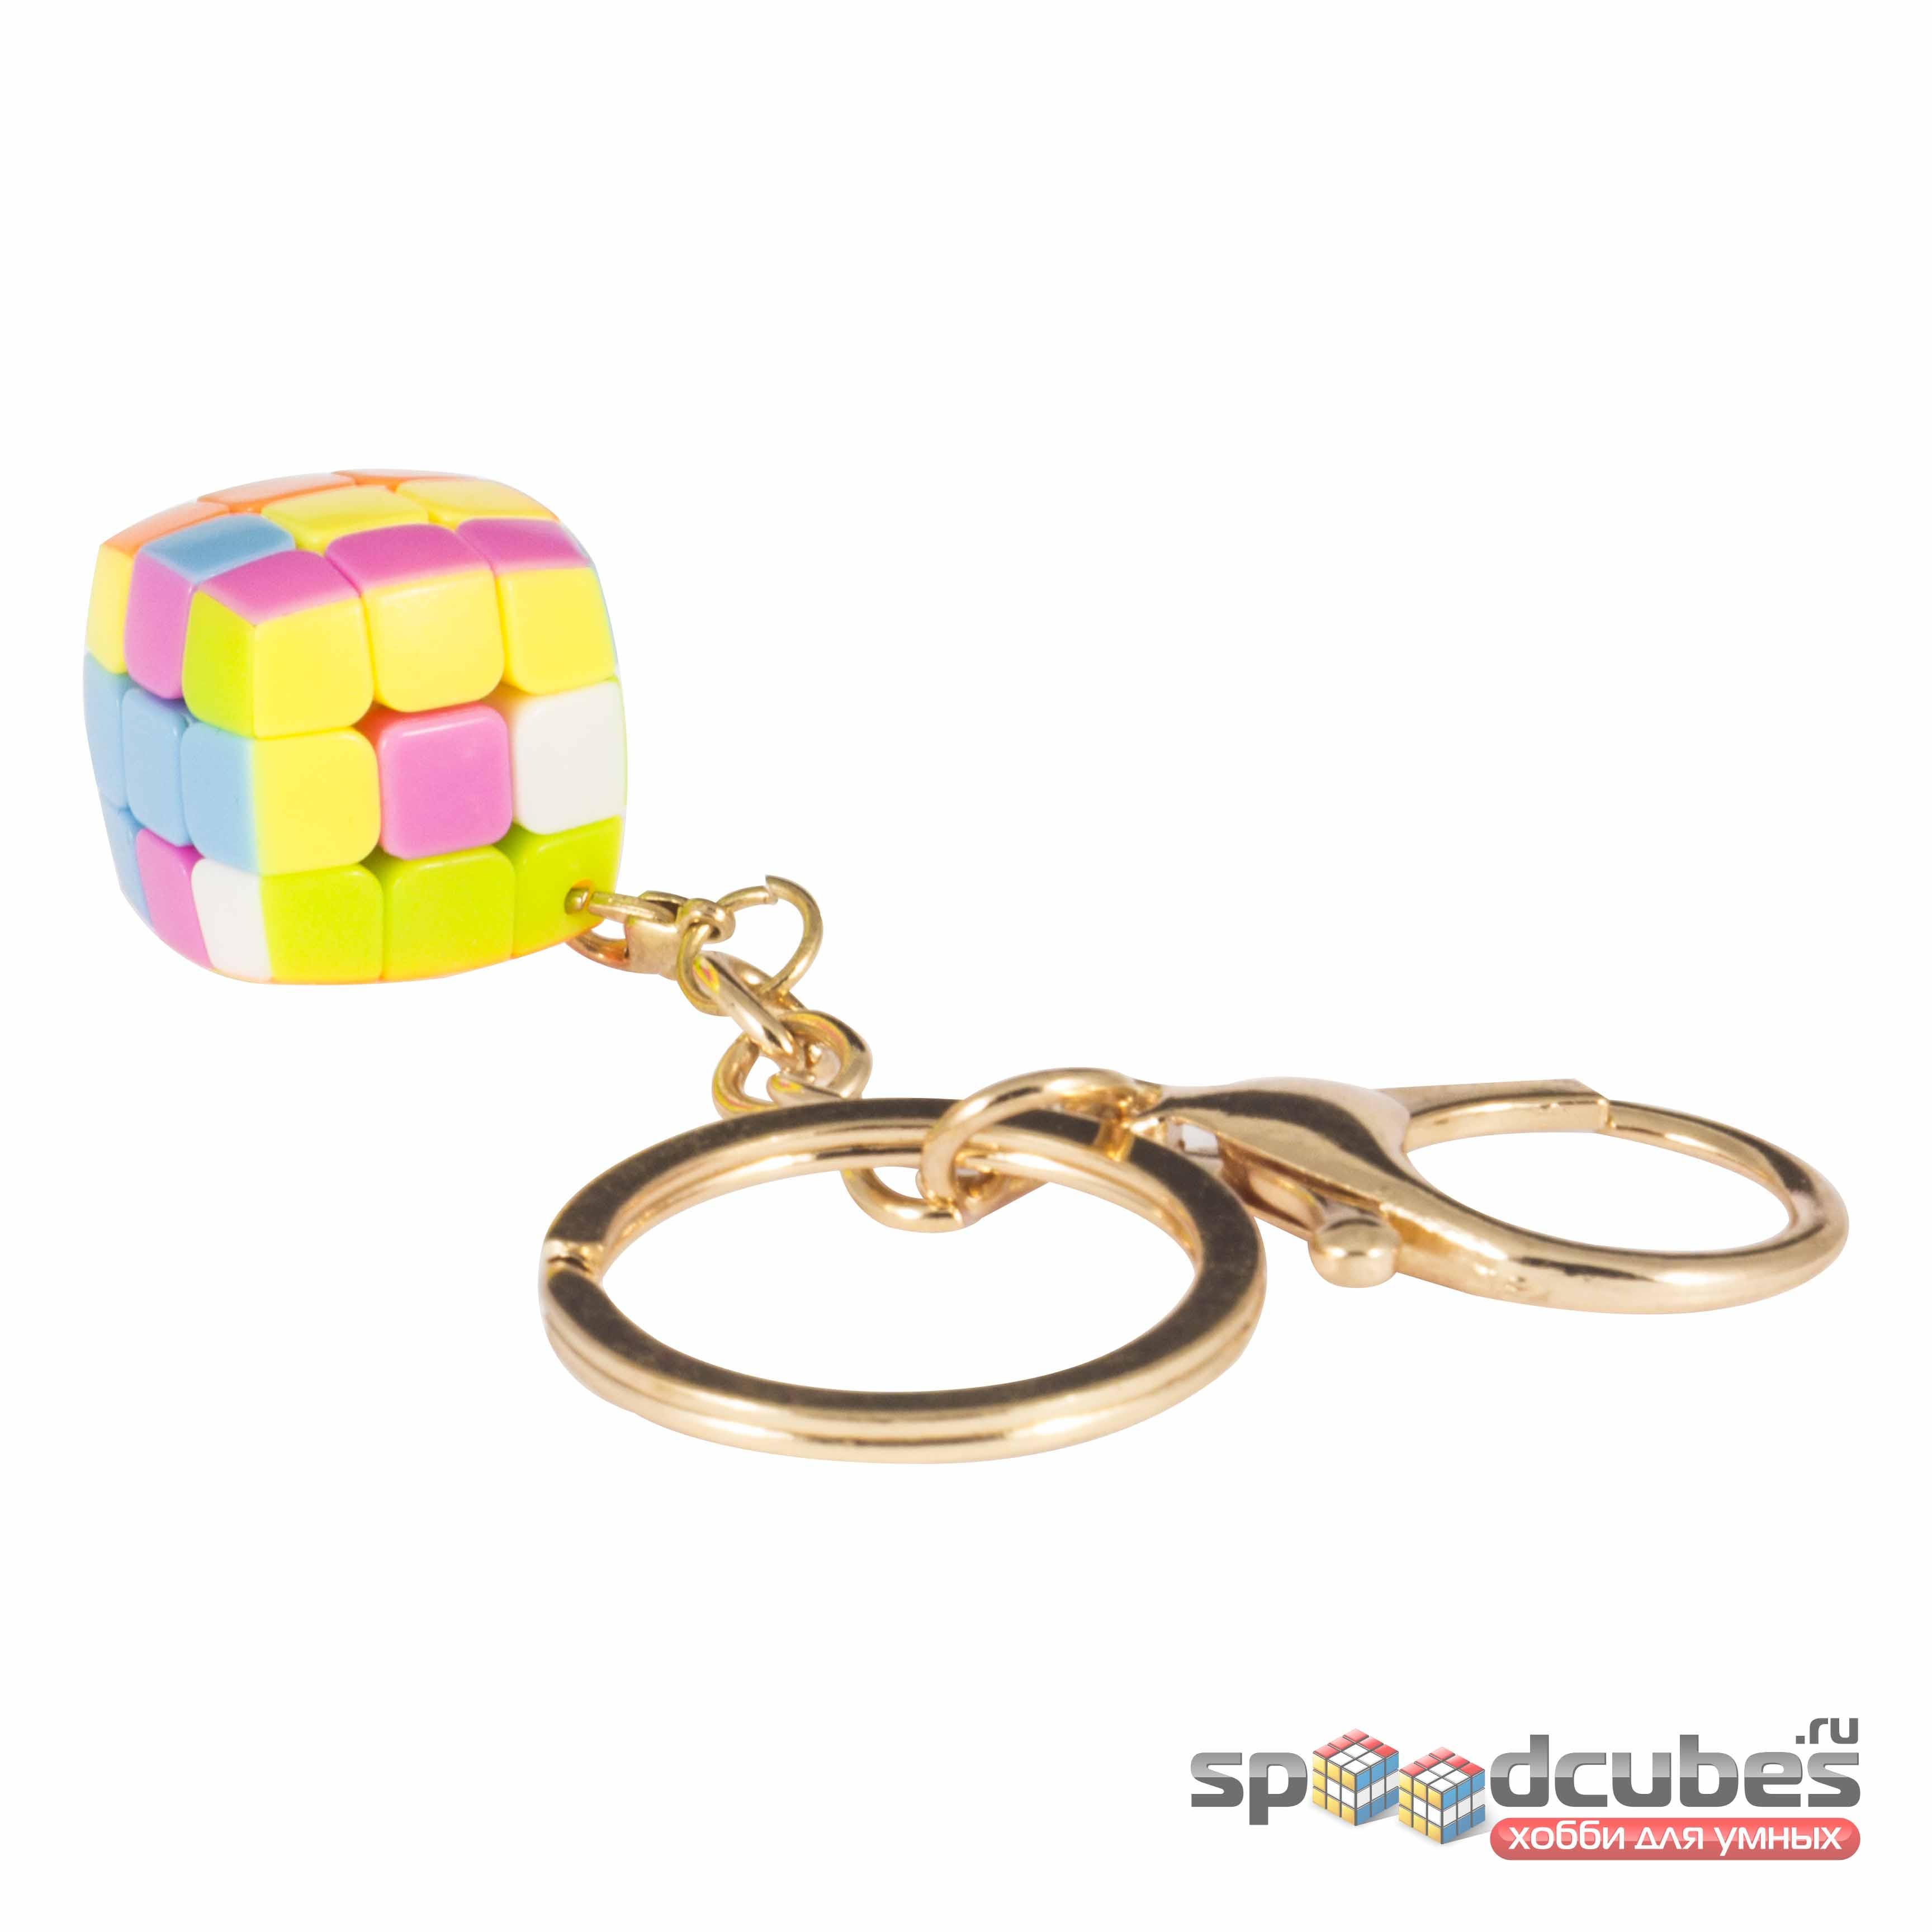 YJ 3x3x3 брелок MiniBread Cube 2.0 см 3